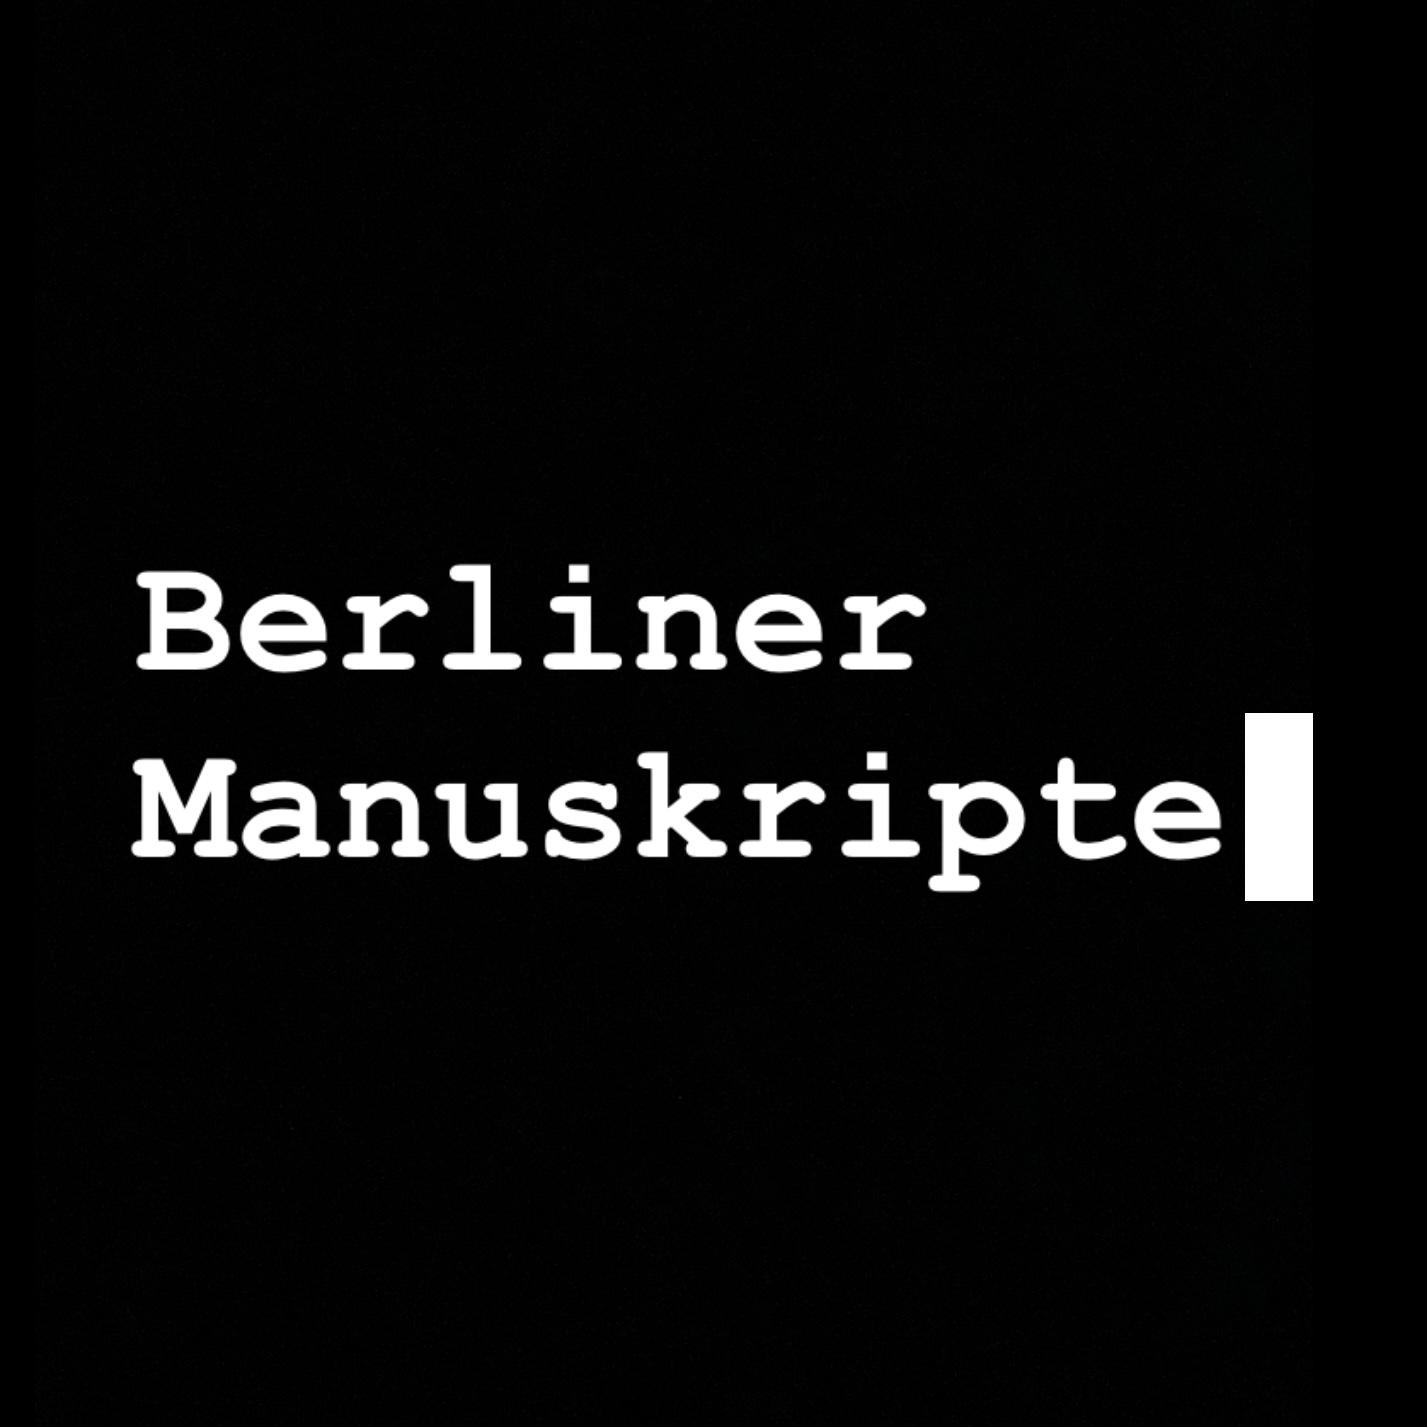 Berlin, Stadt der Autor:innen